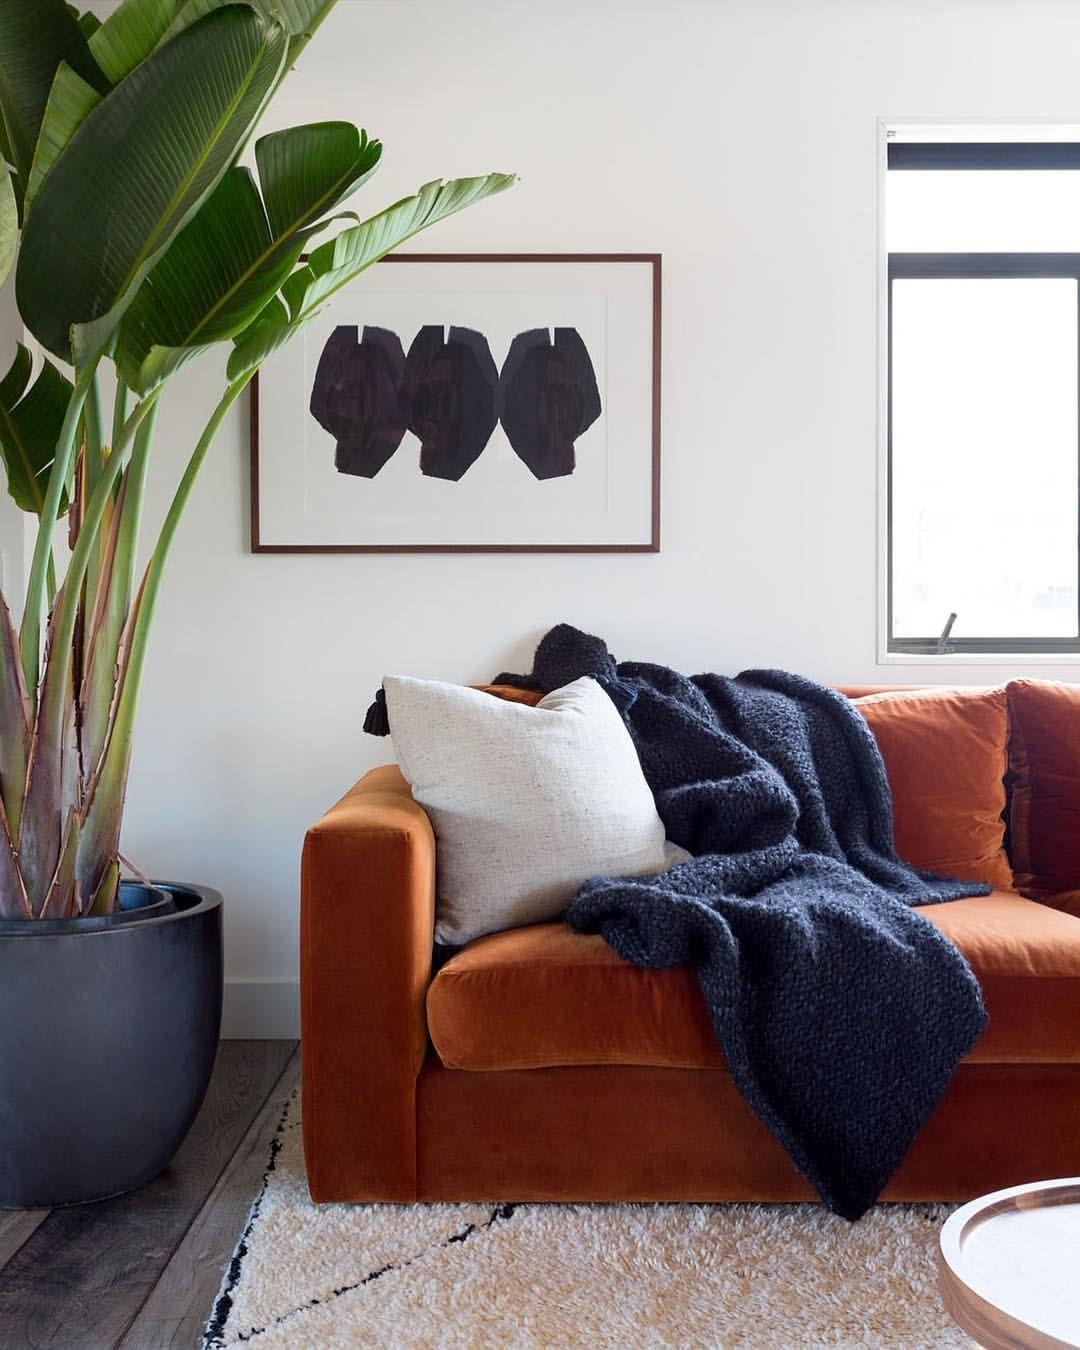 Pin By Naemi Rosander On Balcony Inspo Pinterest Living Rooms